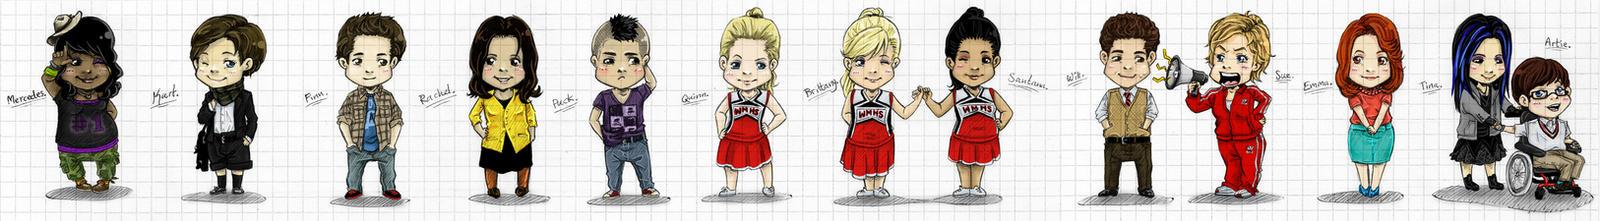 Glee - Gleebis by Kumagorochan